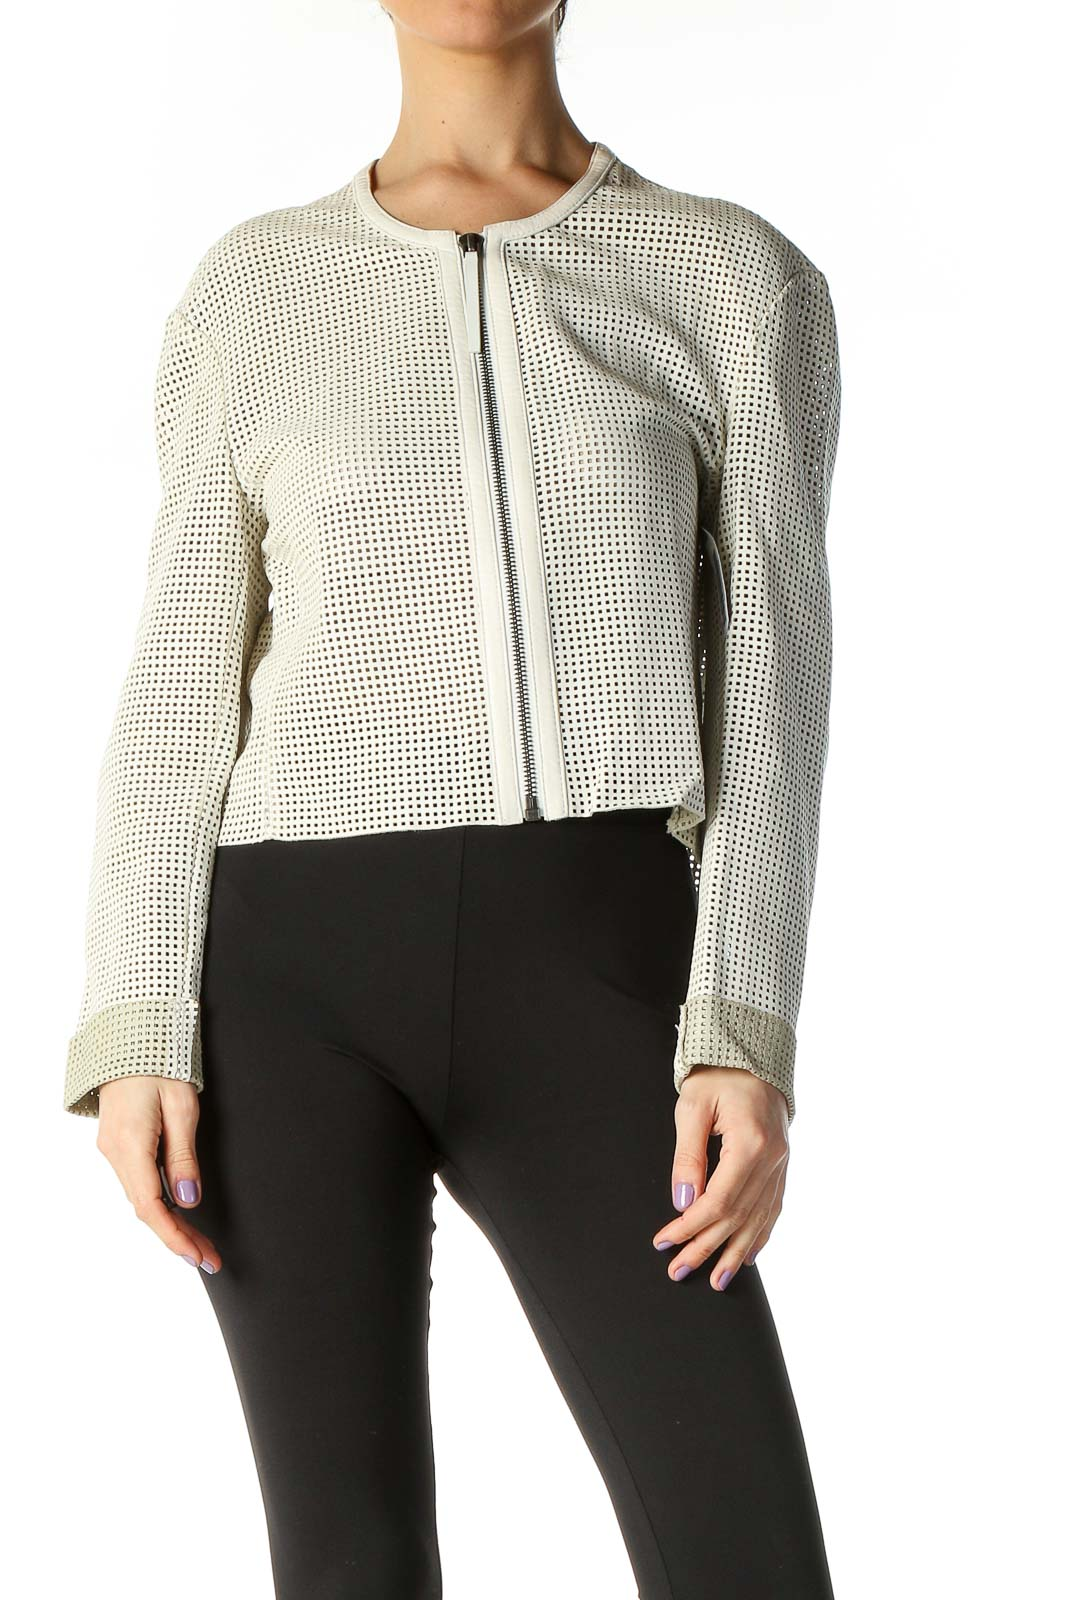 White Leather Jacket Front